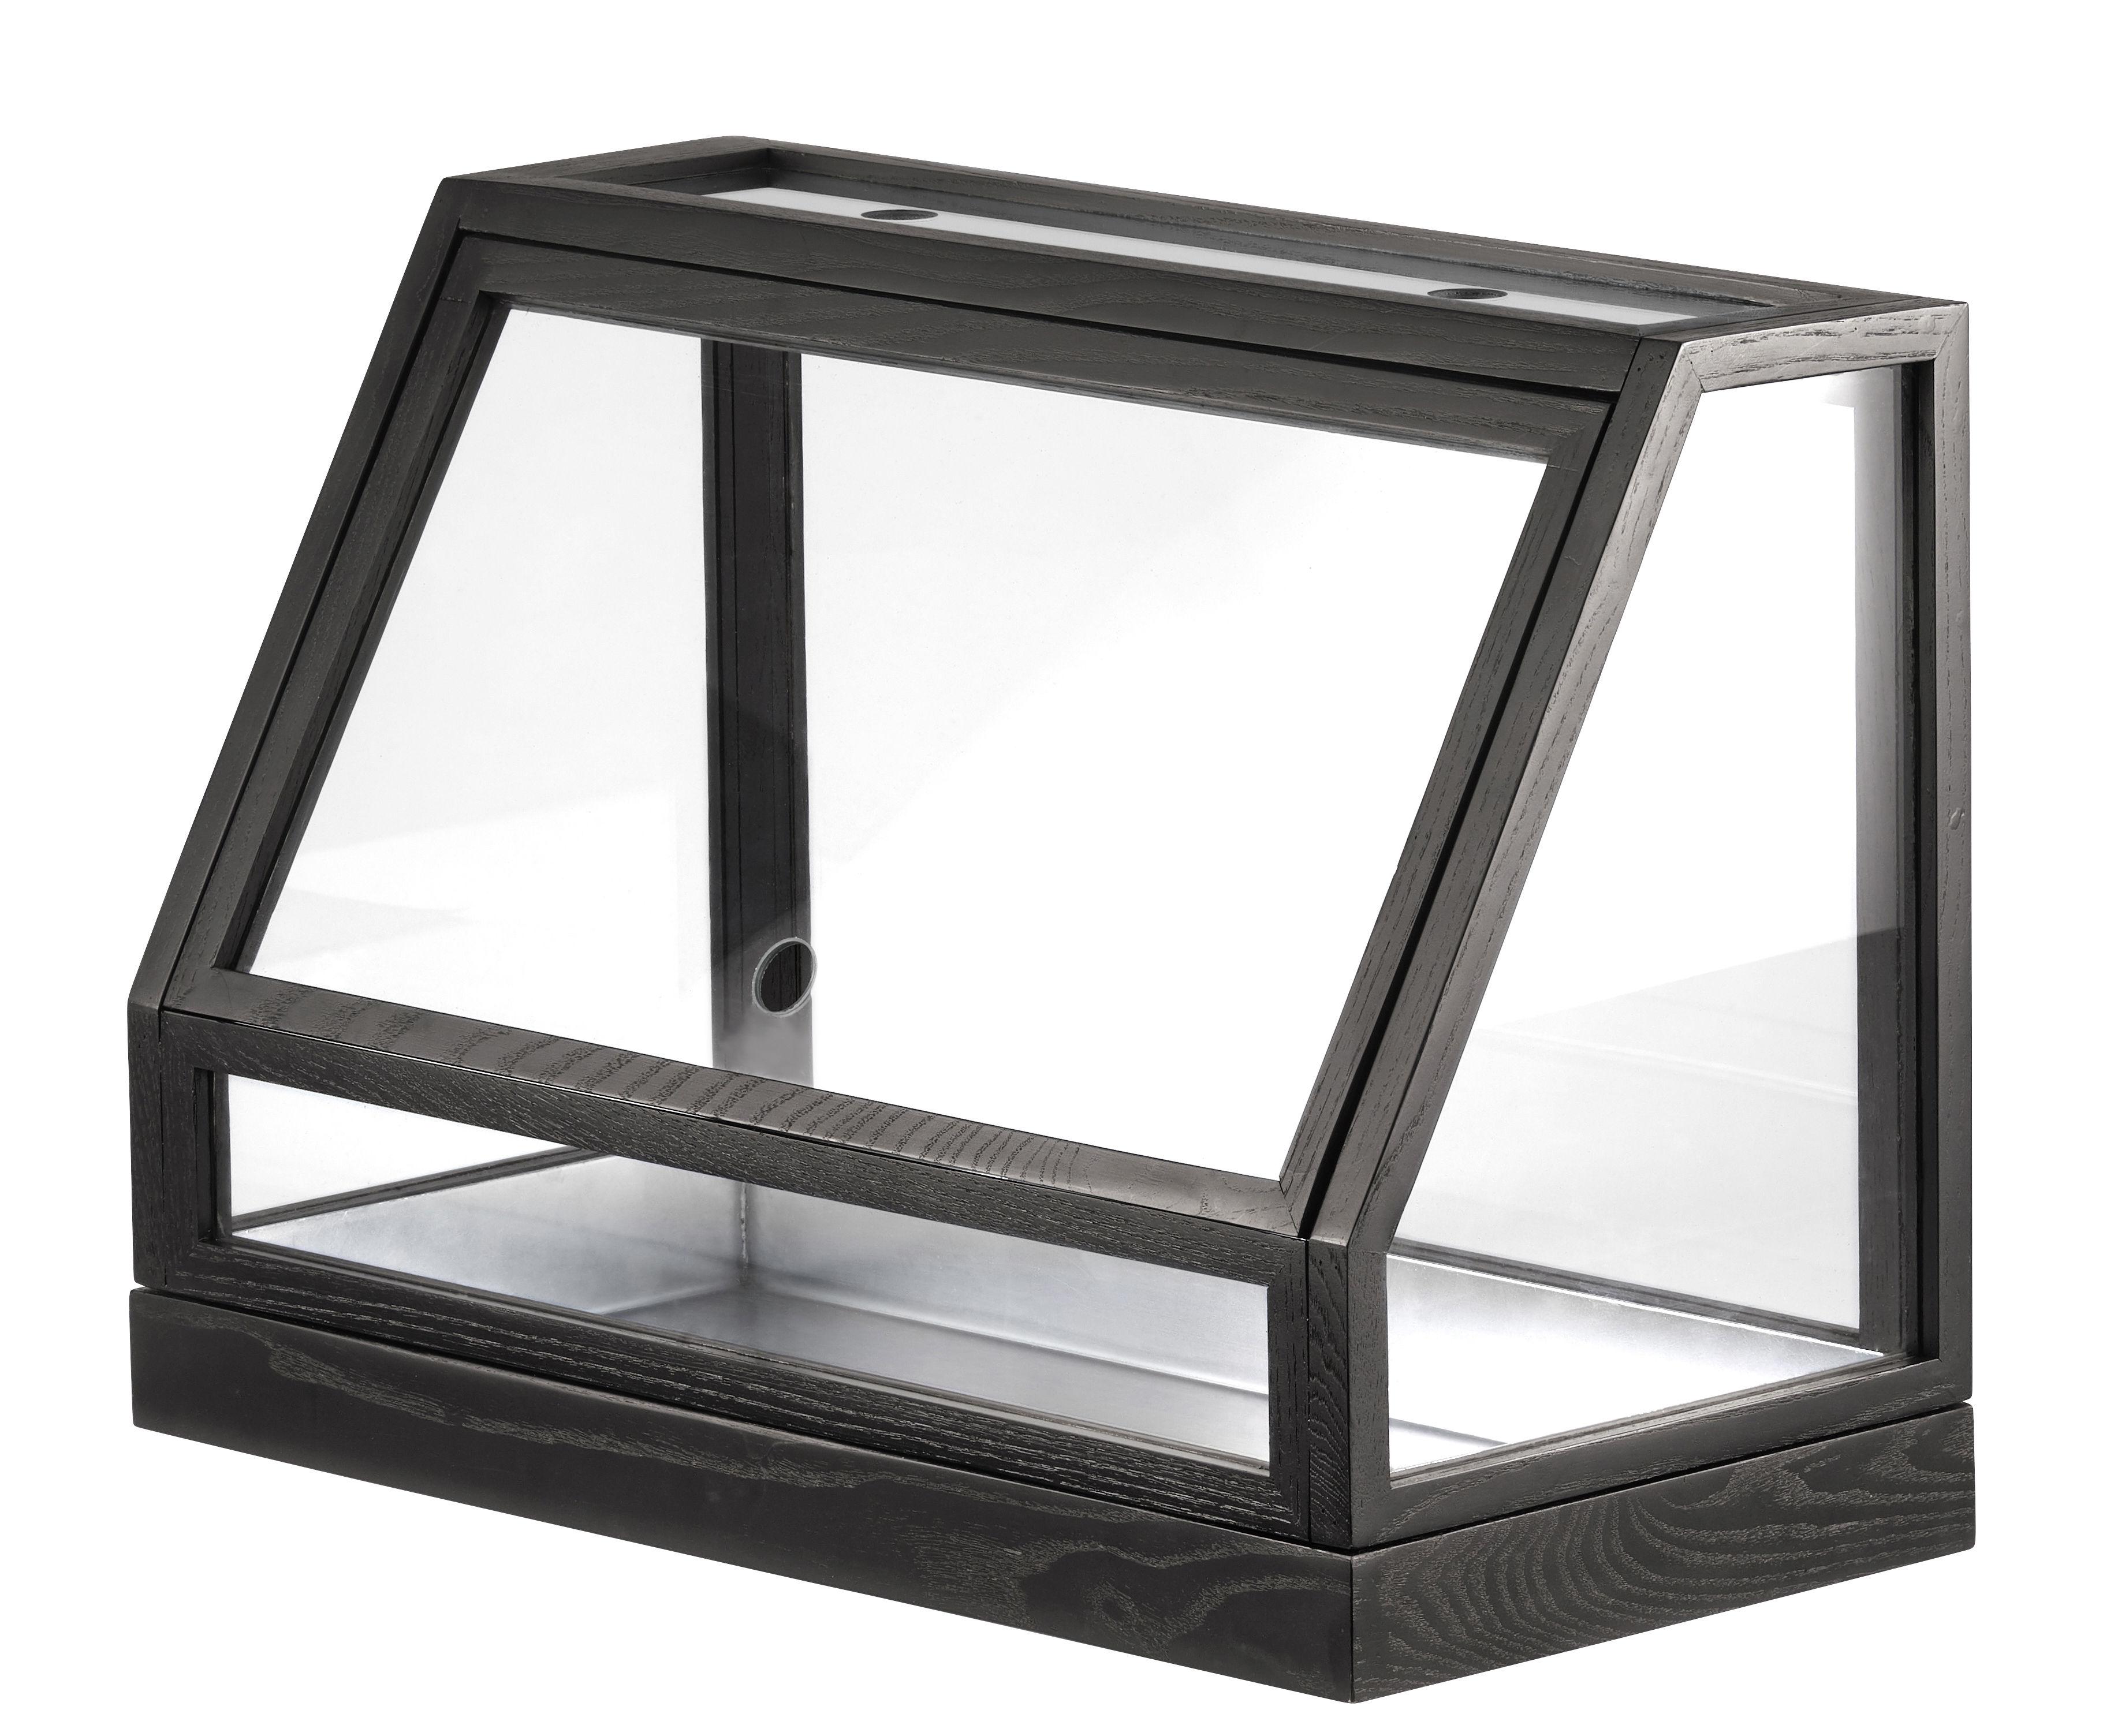 Greenhouse Mini Terrarium L 50 X H 40 Cm Grey By Design House